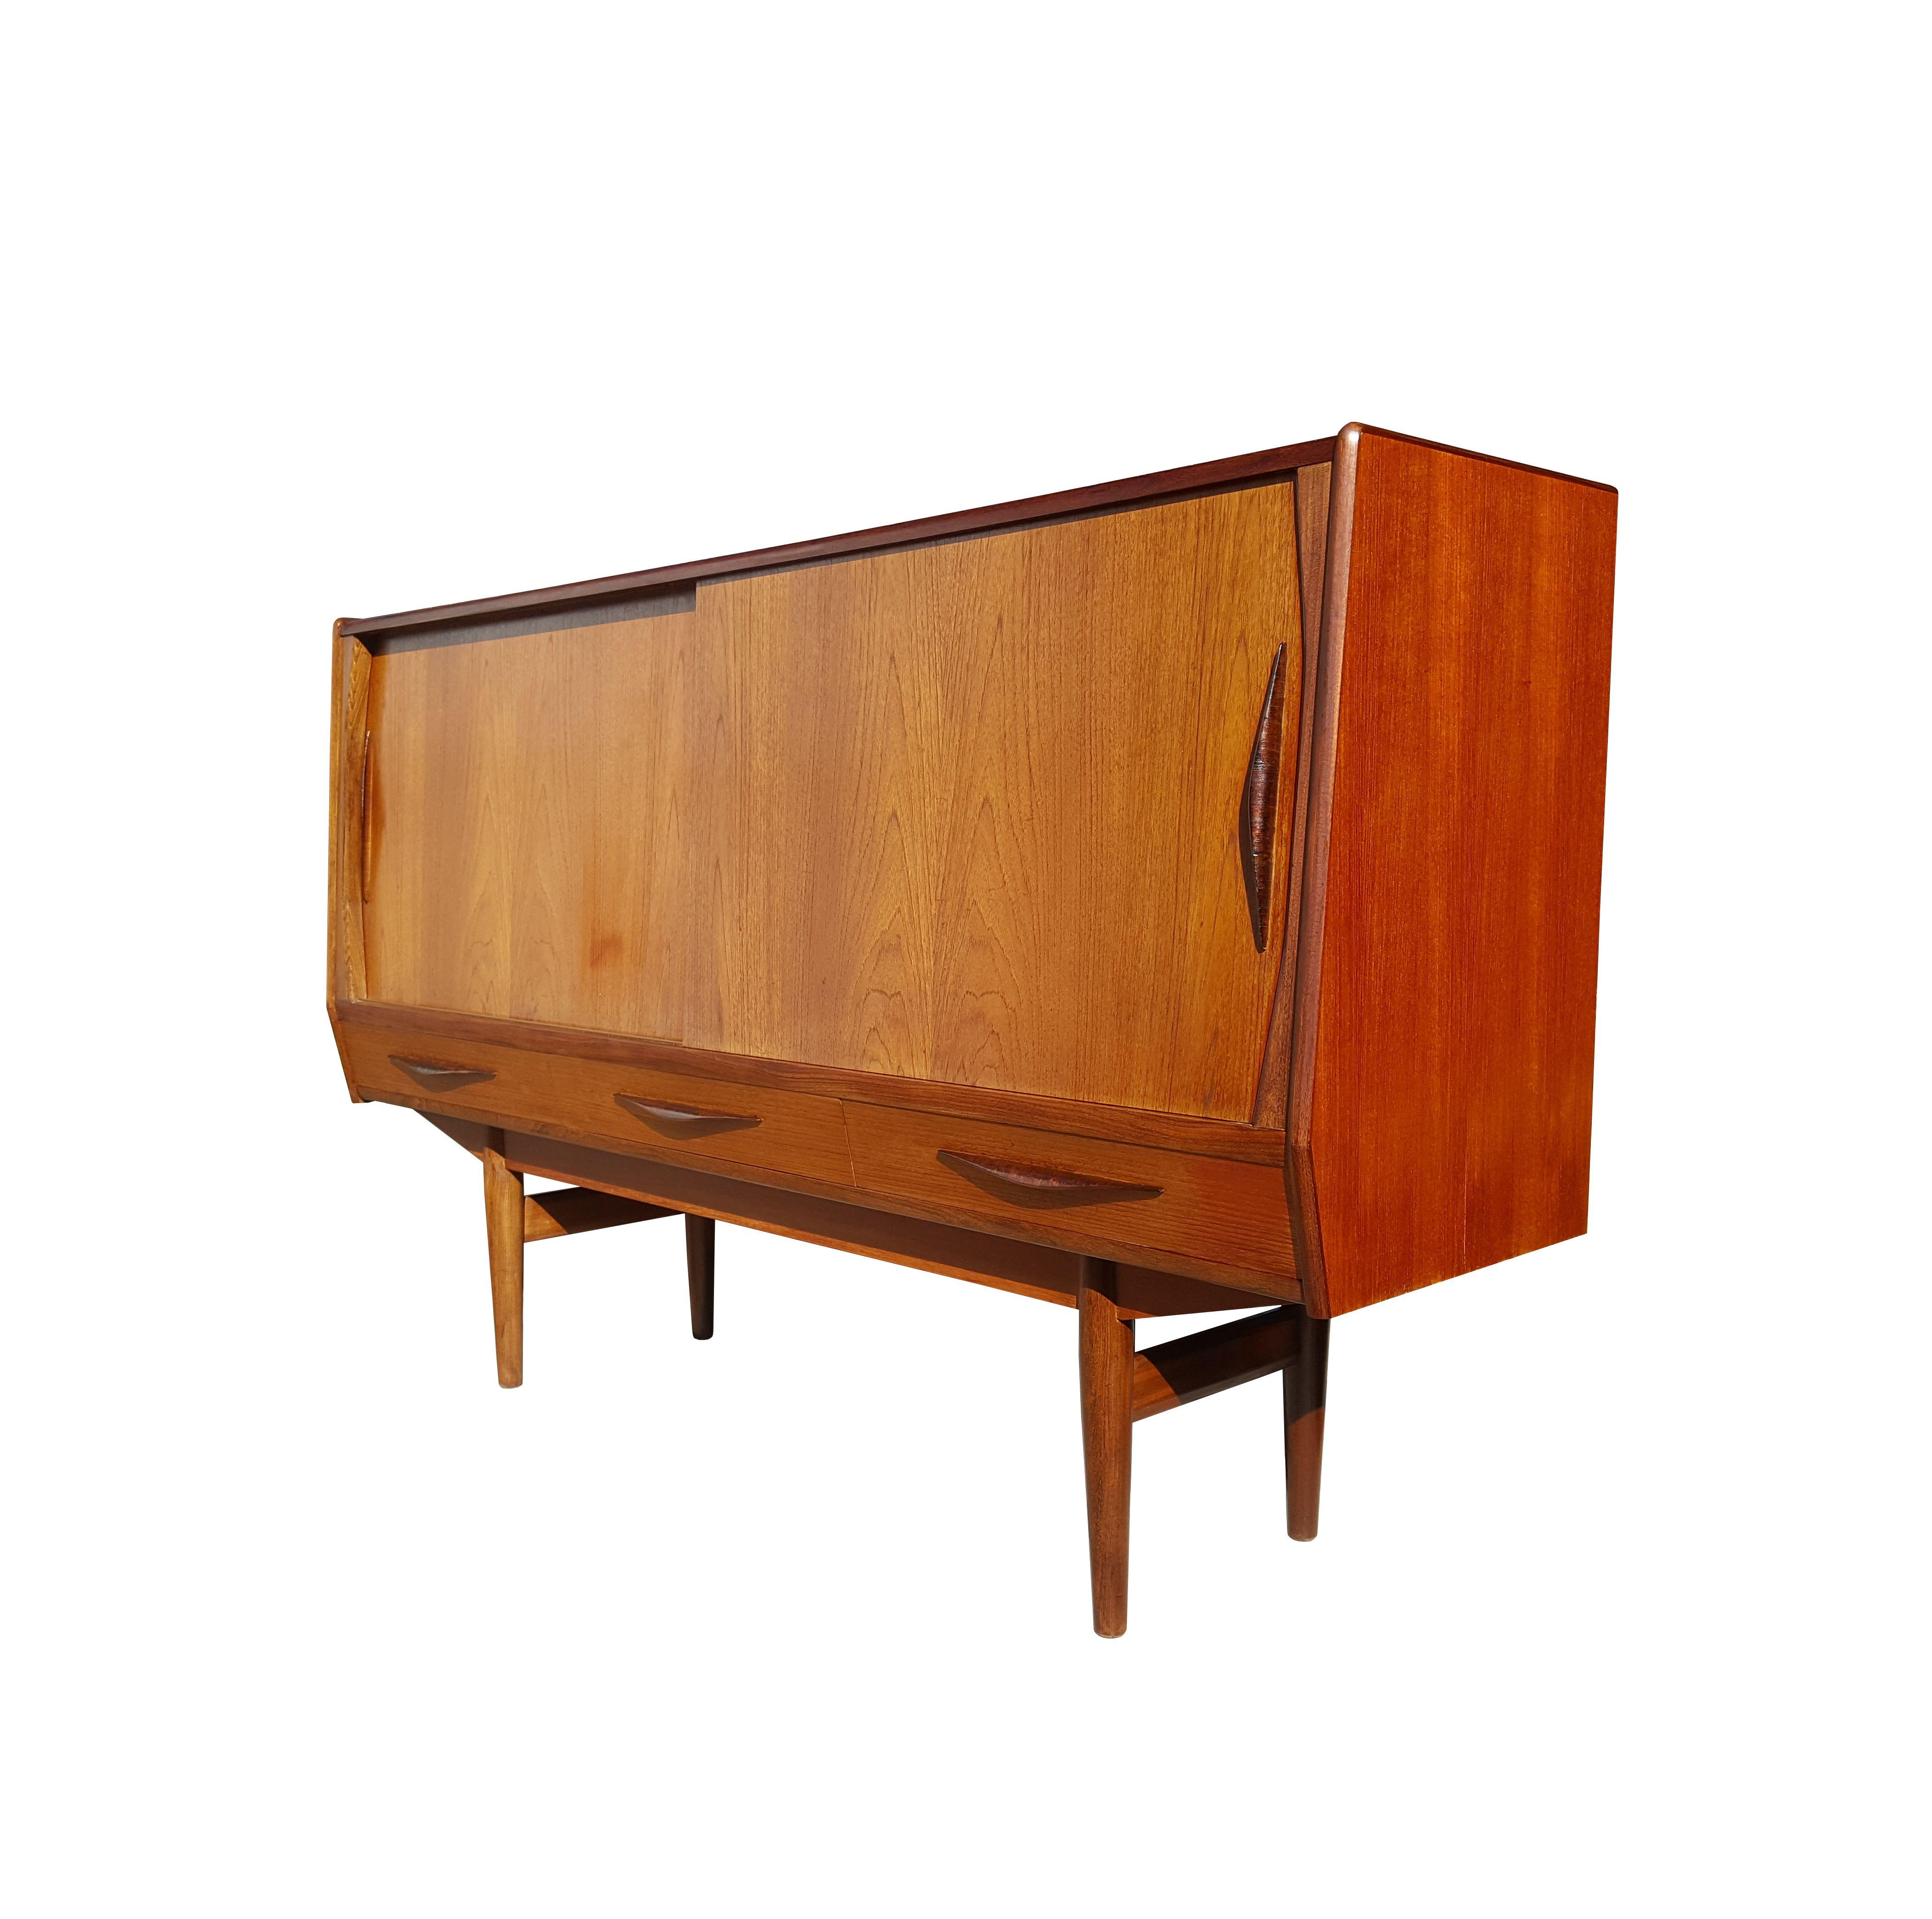 Danish Mid Century Modern Teakwood Sideboard High Board Credenza